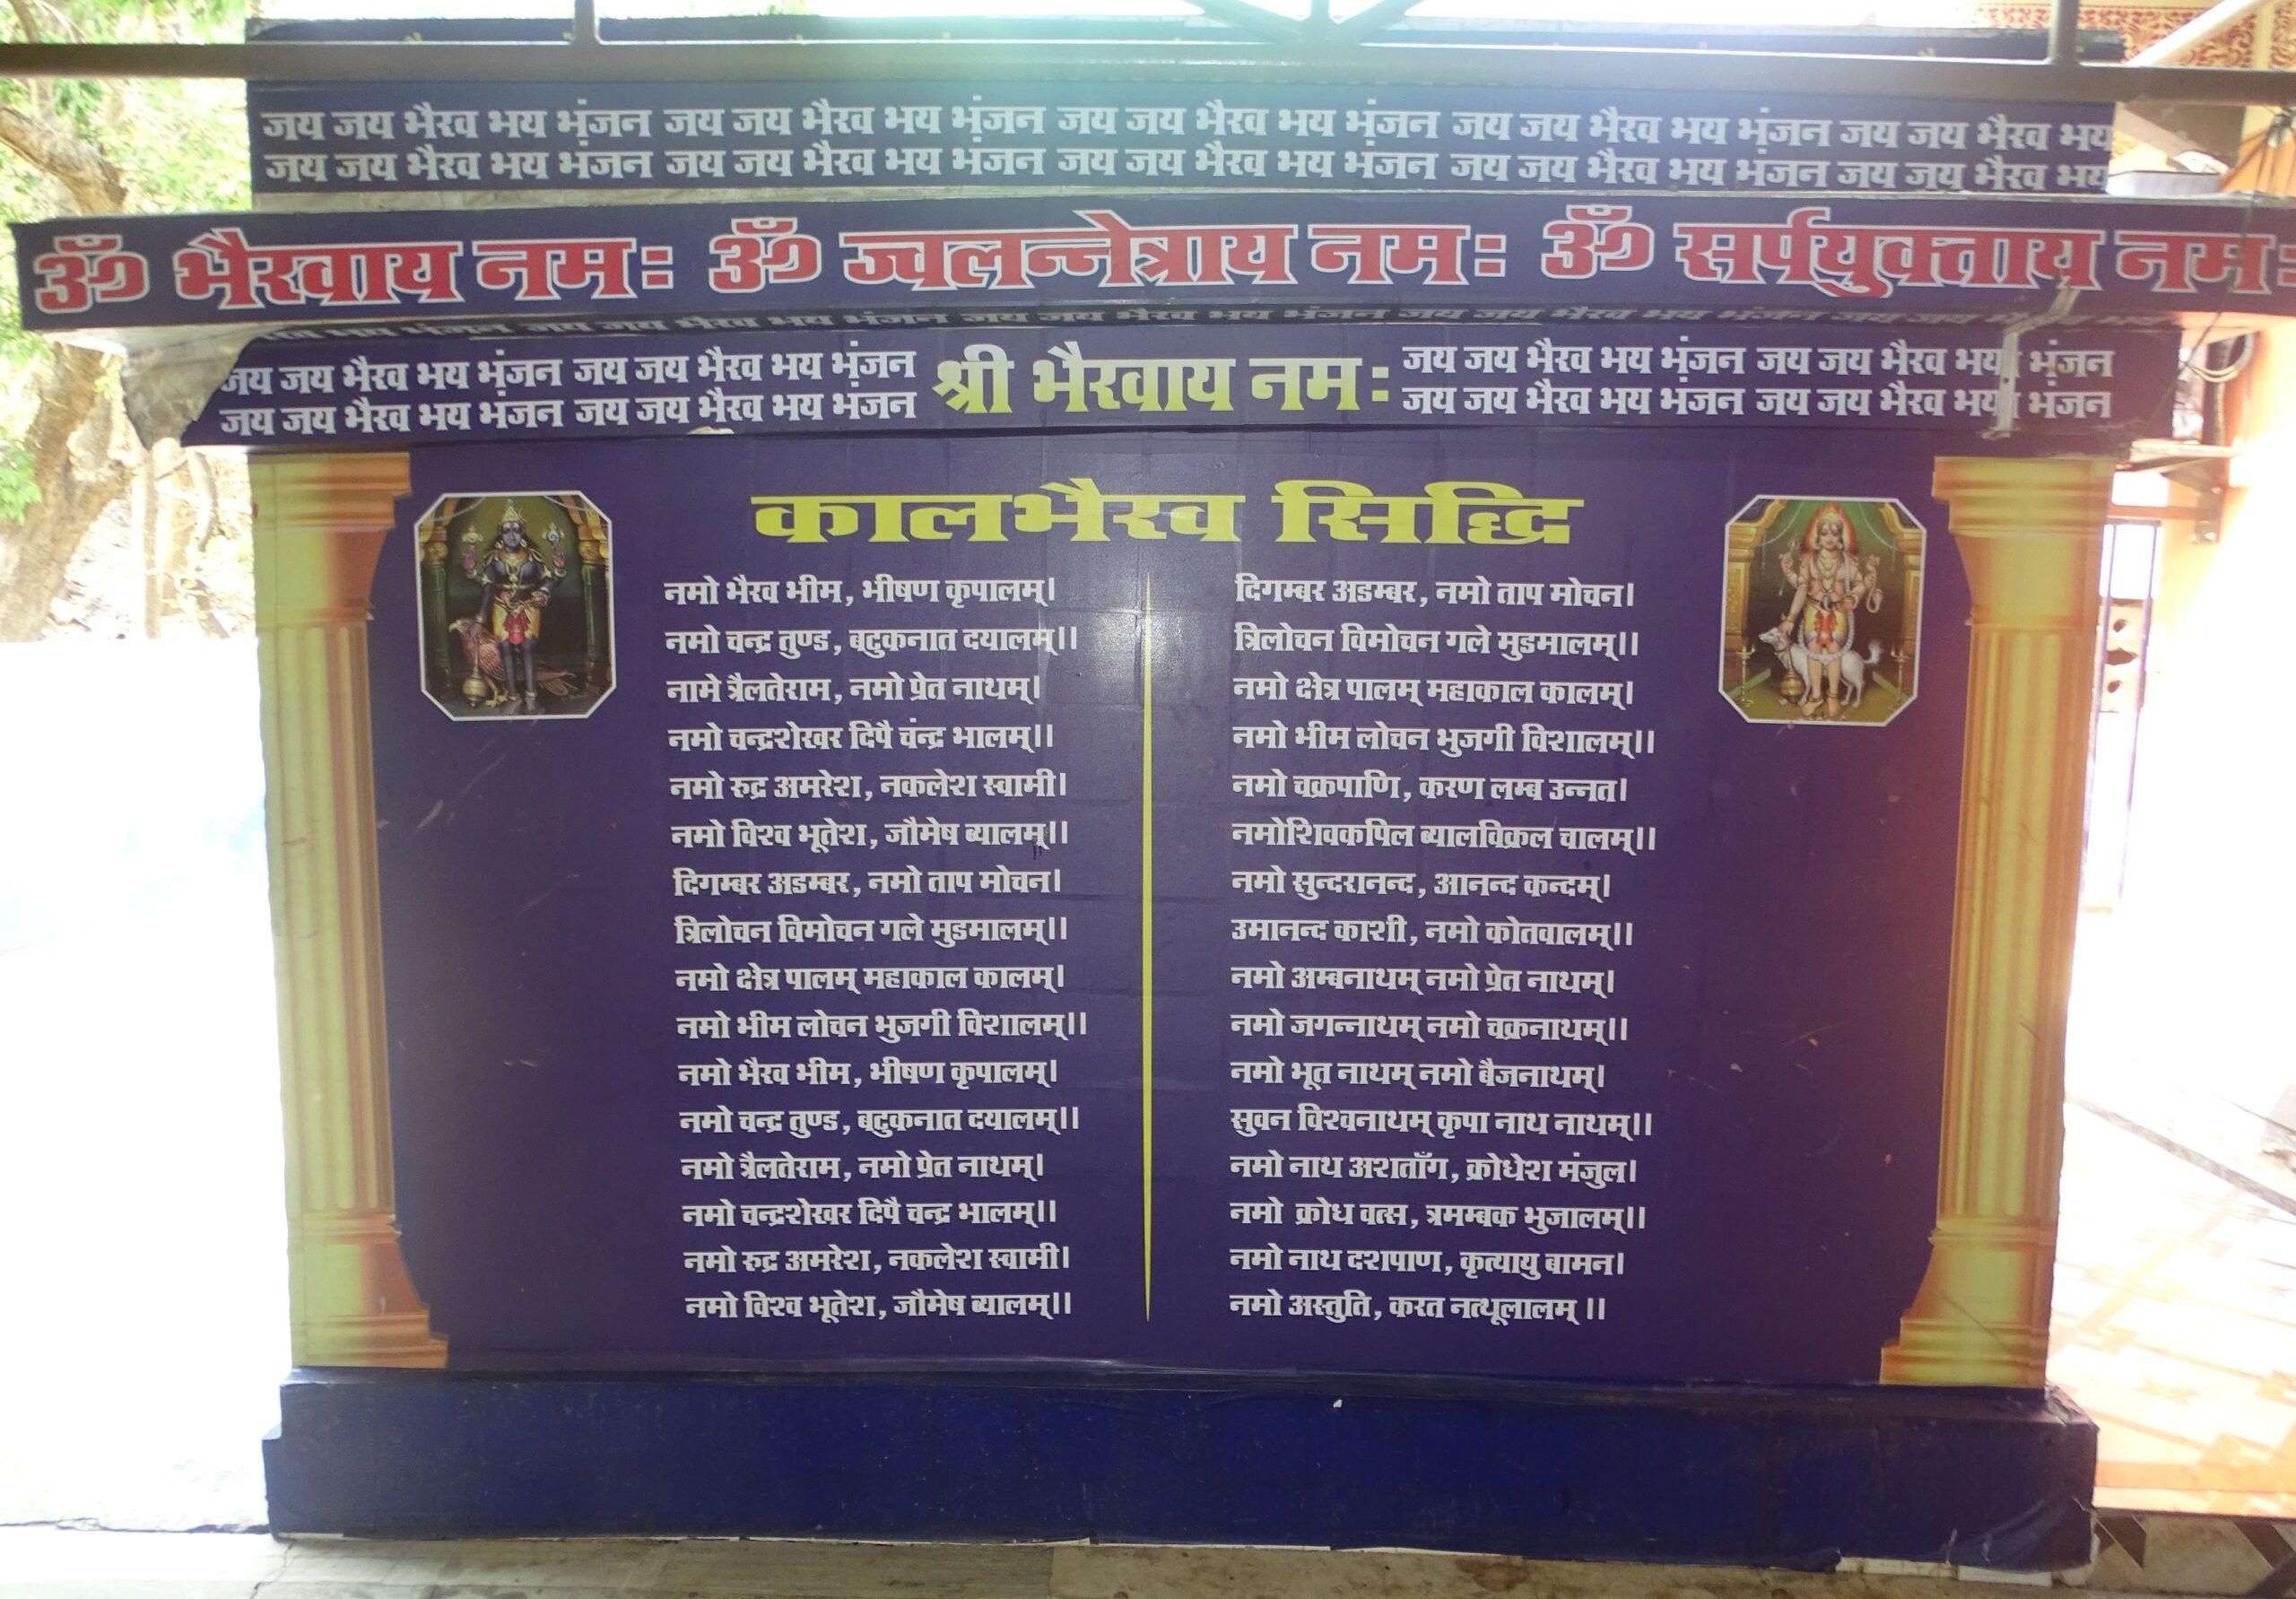 Kaal Bhairav Siddhi